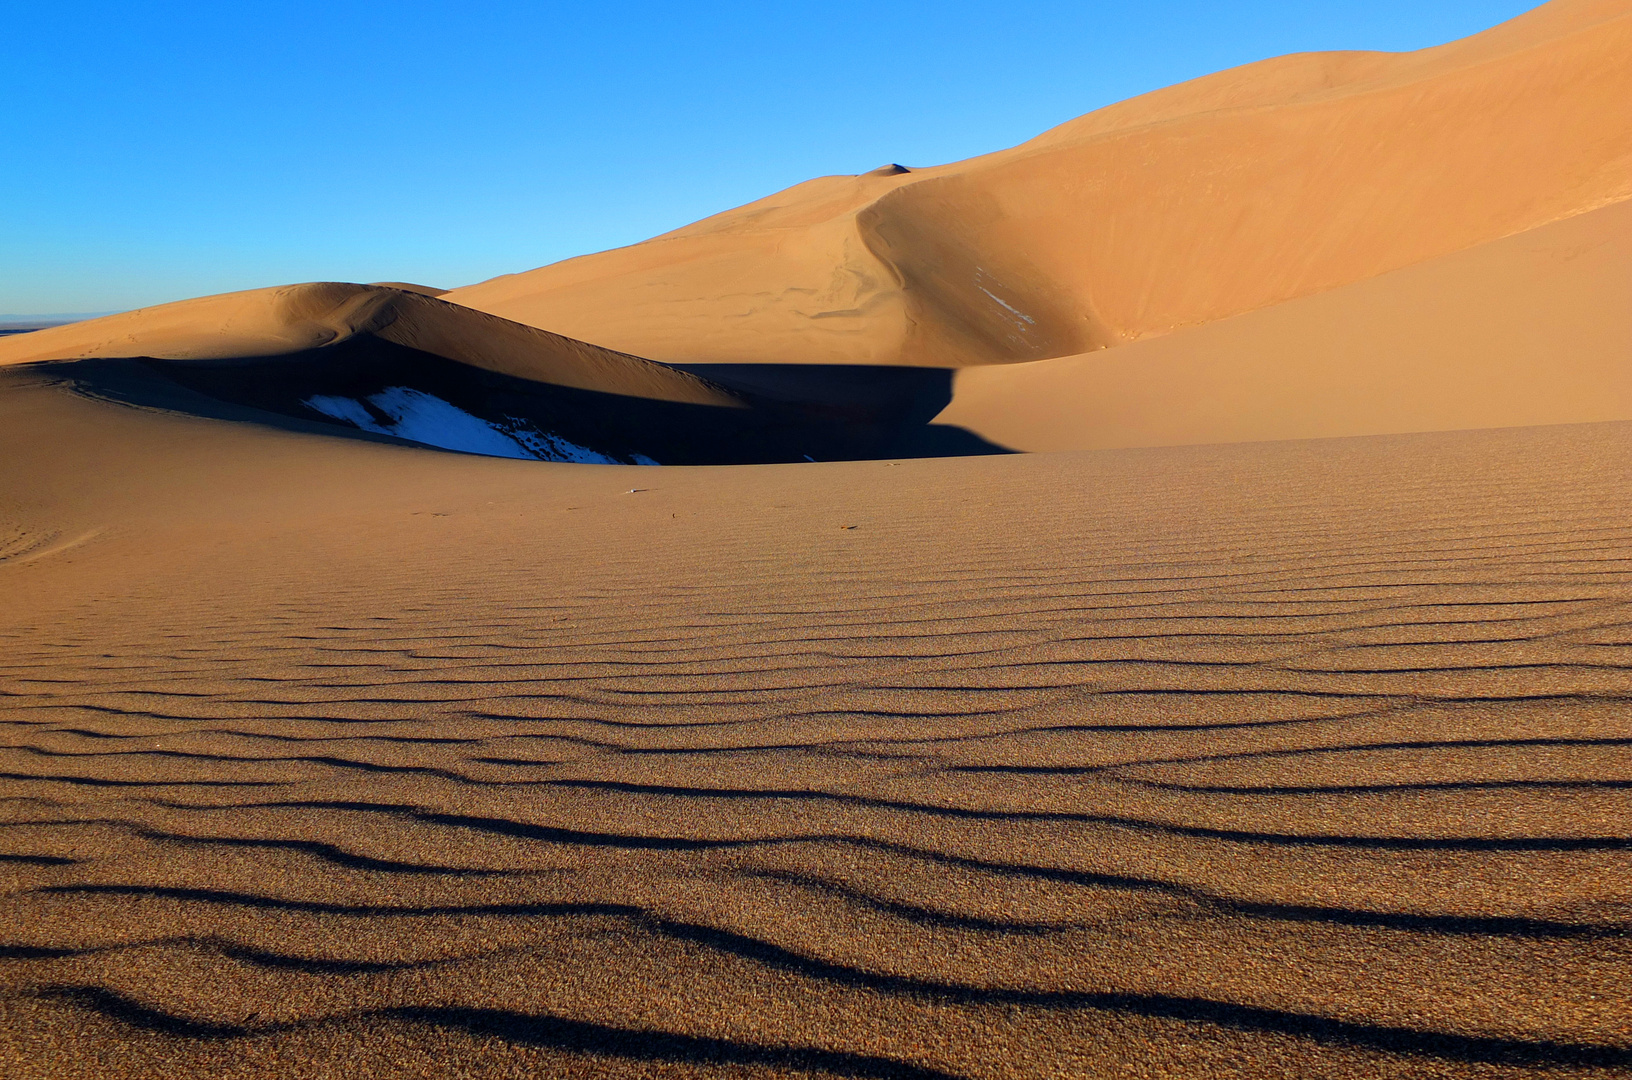 The Great Sand Dunes (Colorado) im Oktober